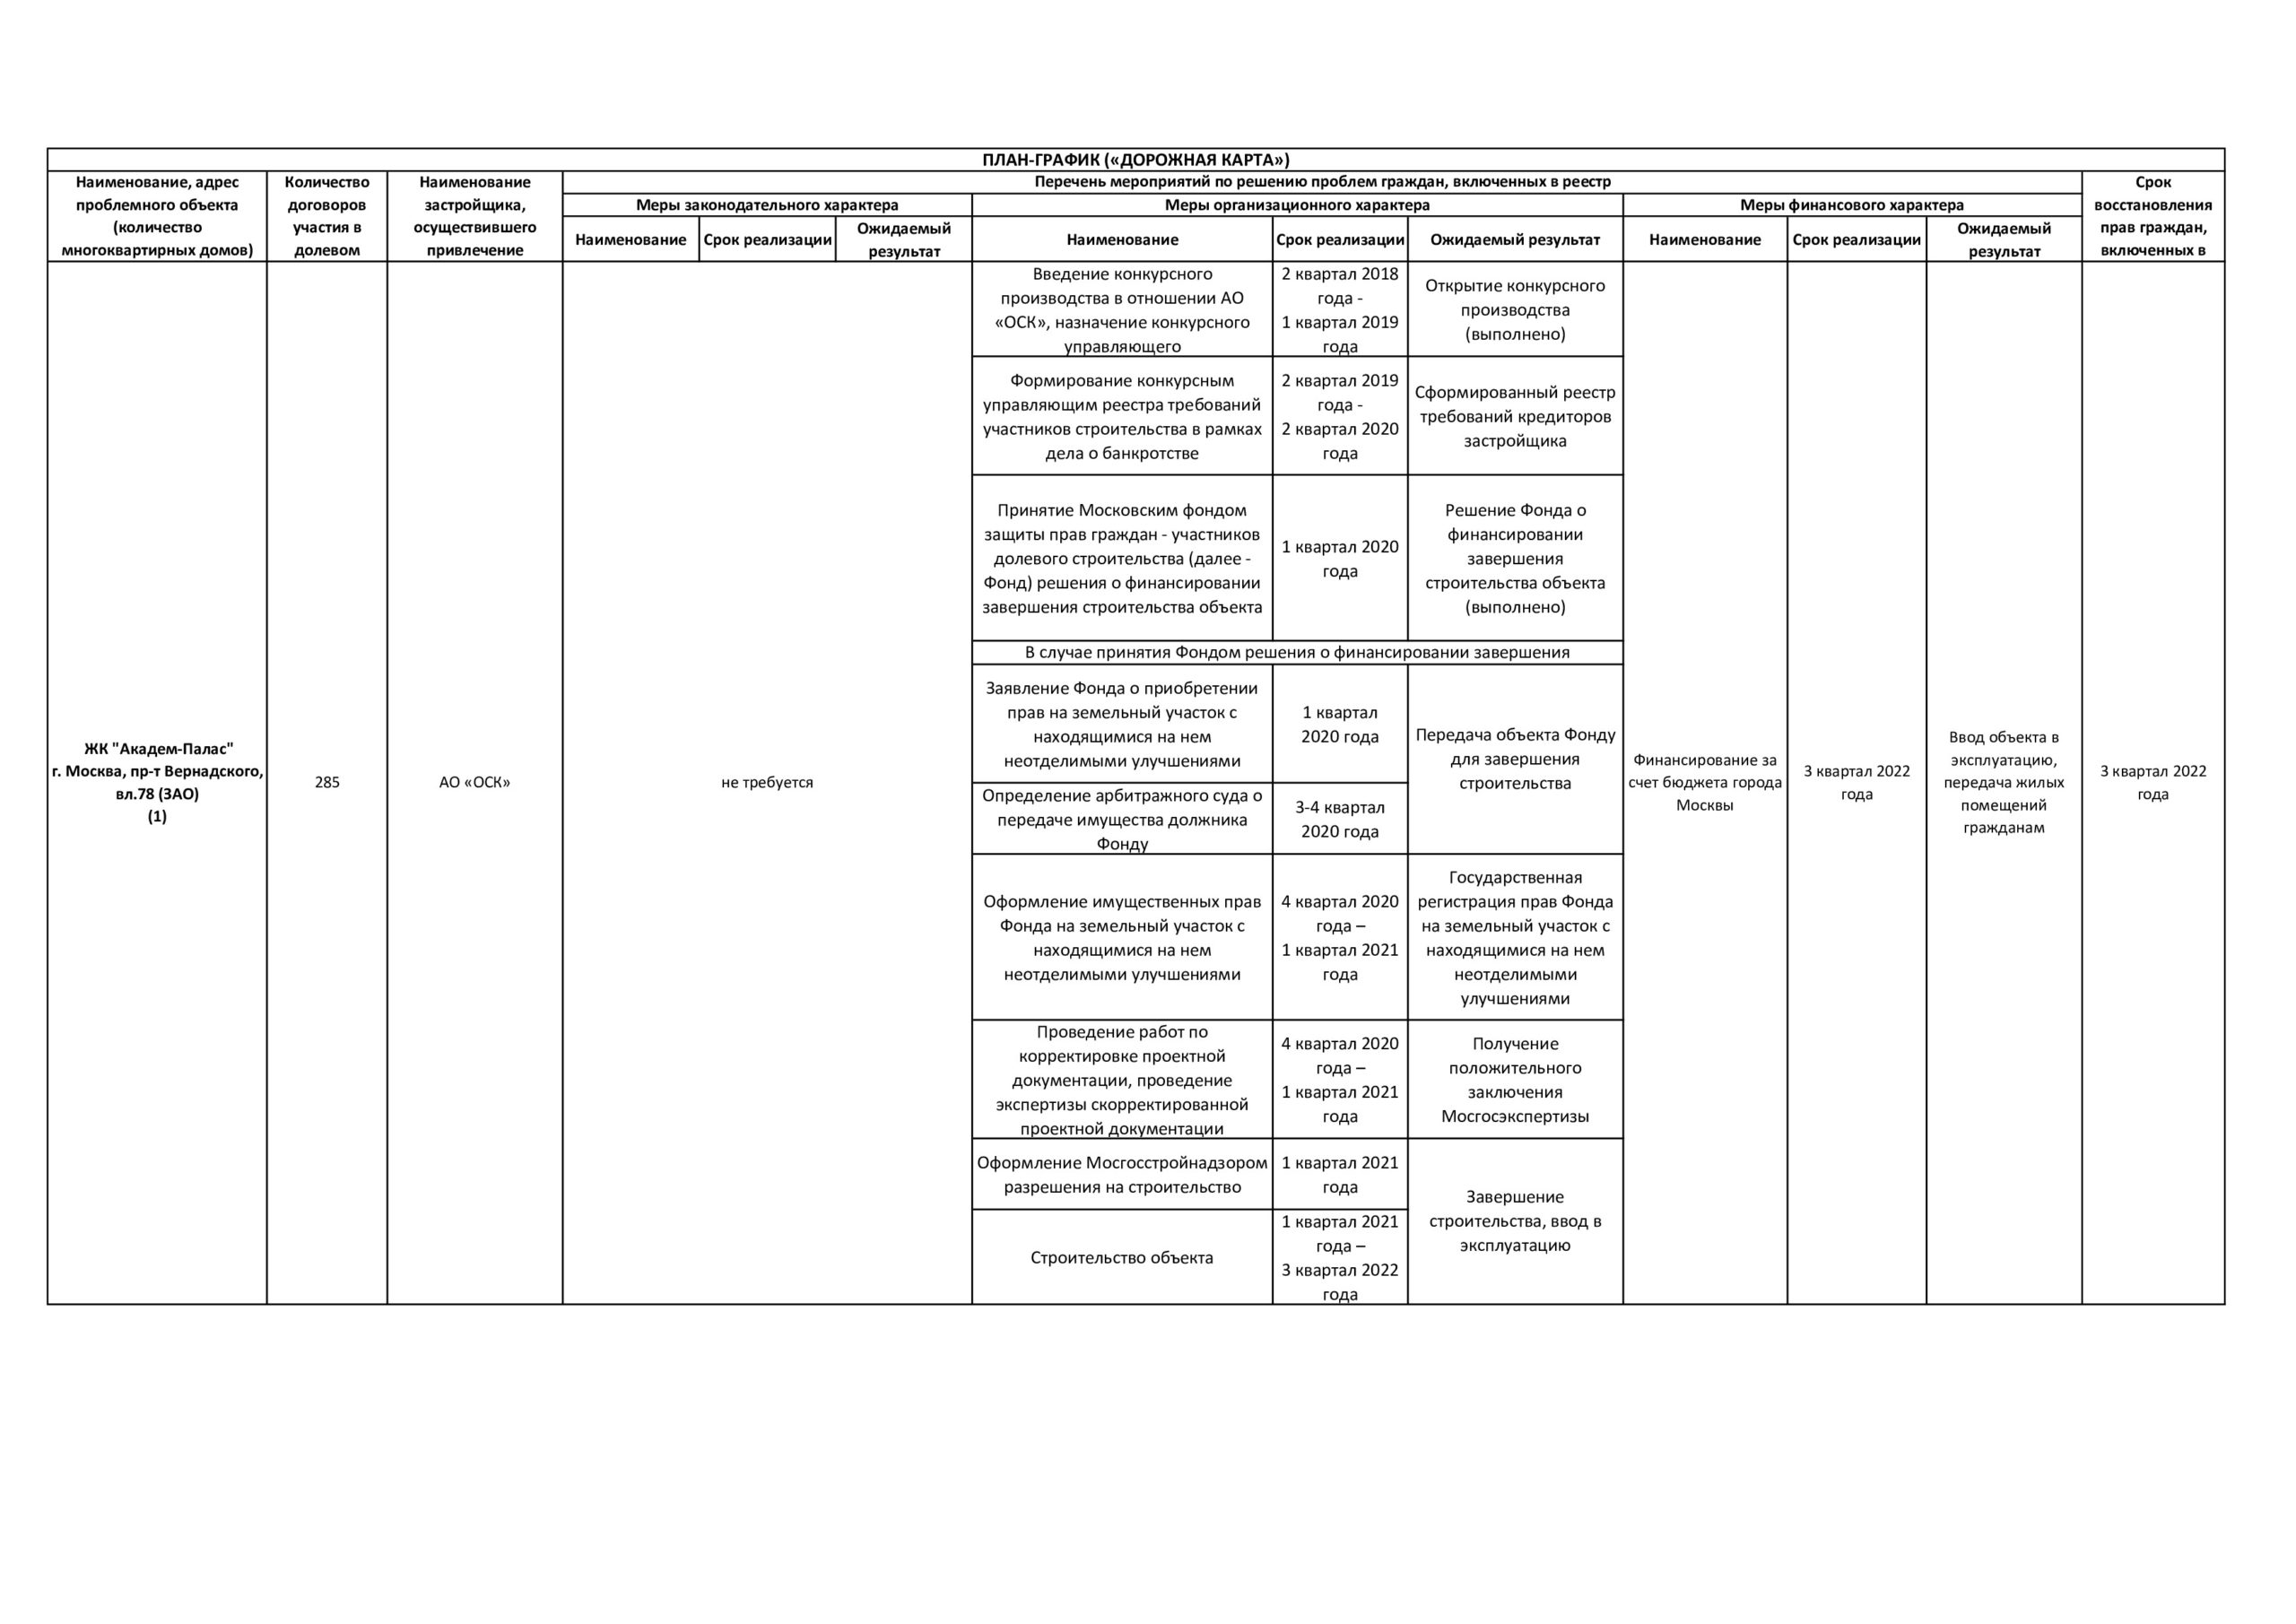 Реализация проекта ЖК Академ Палас